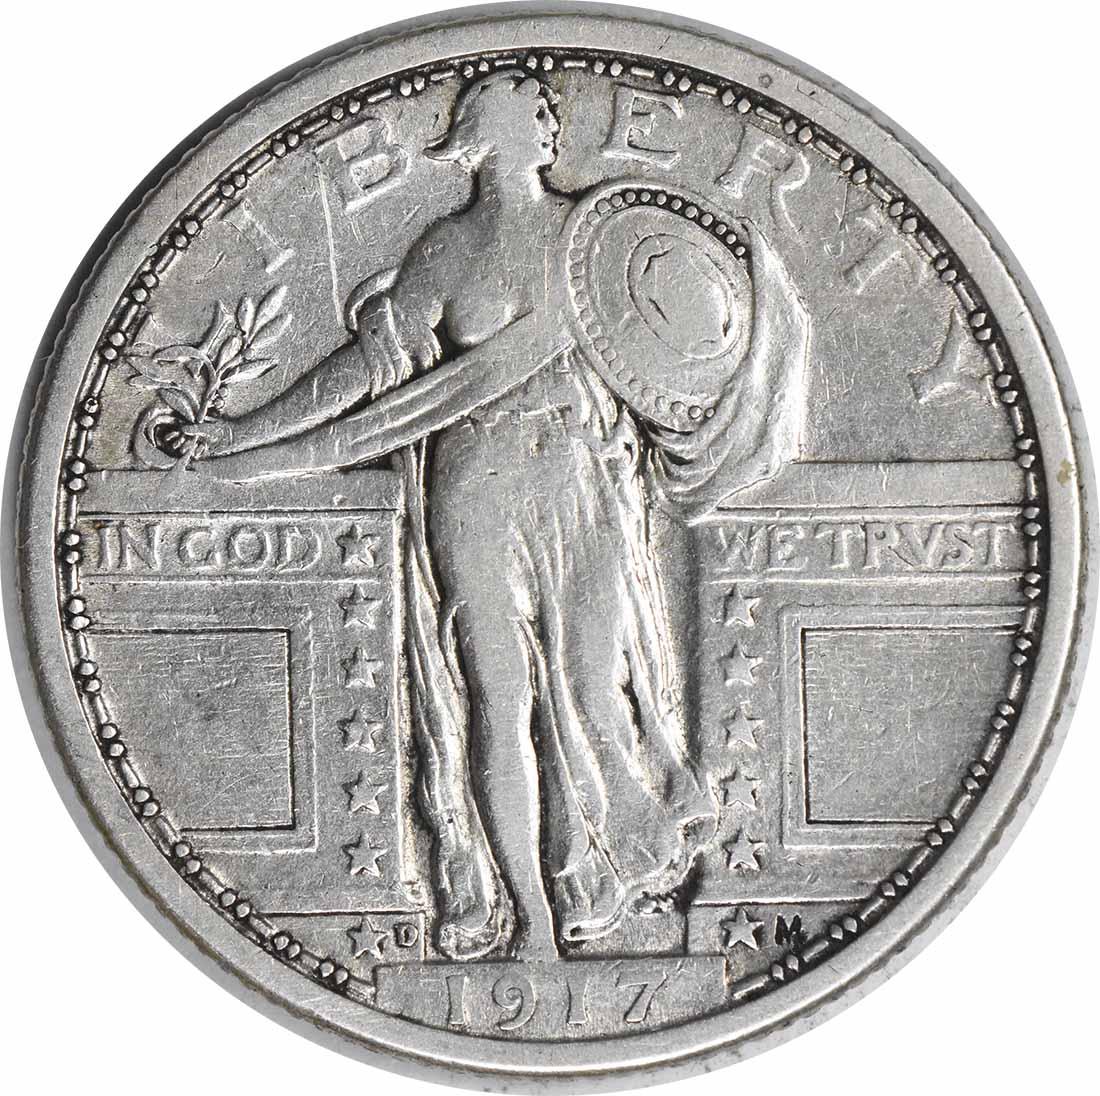 1917-D Standing Liberty Silver Quarter Type 1 EF Uncertified #1147